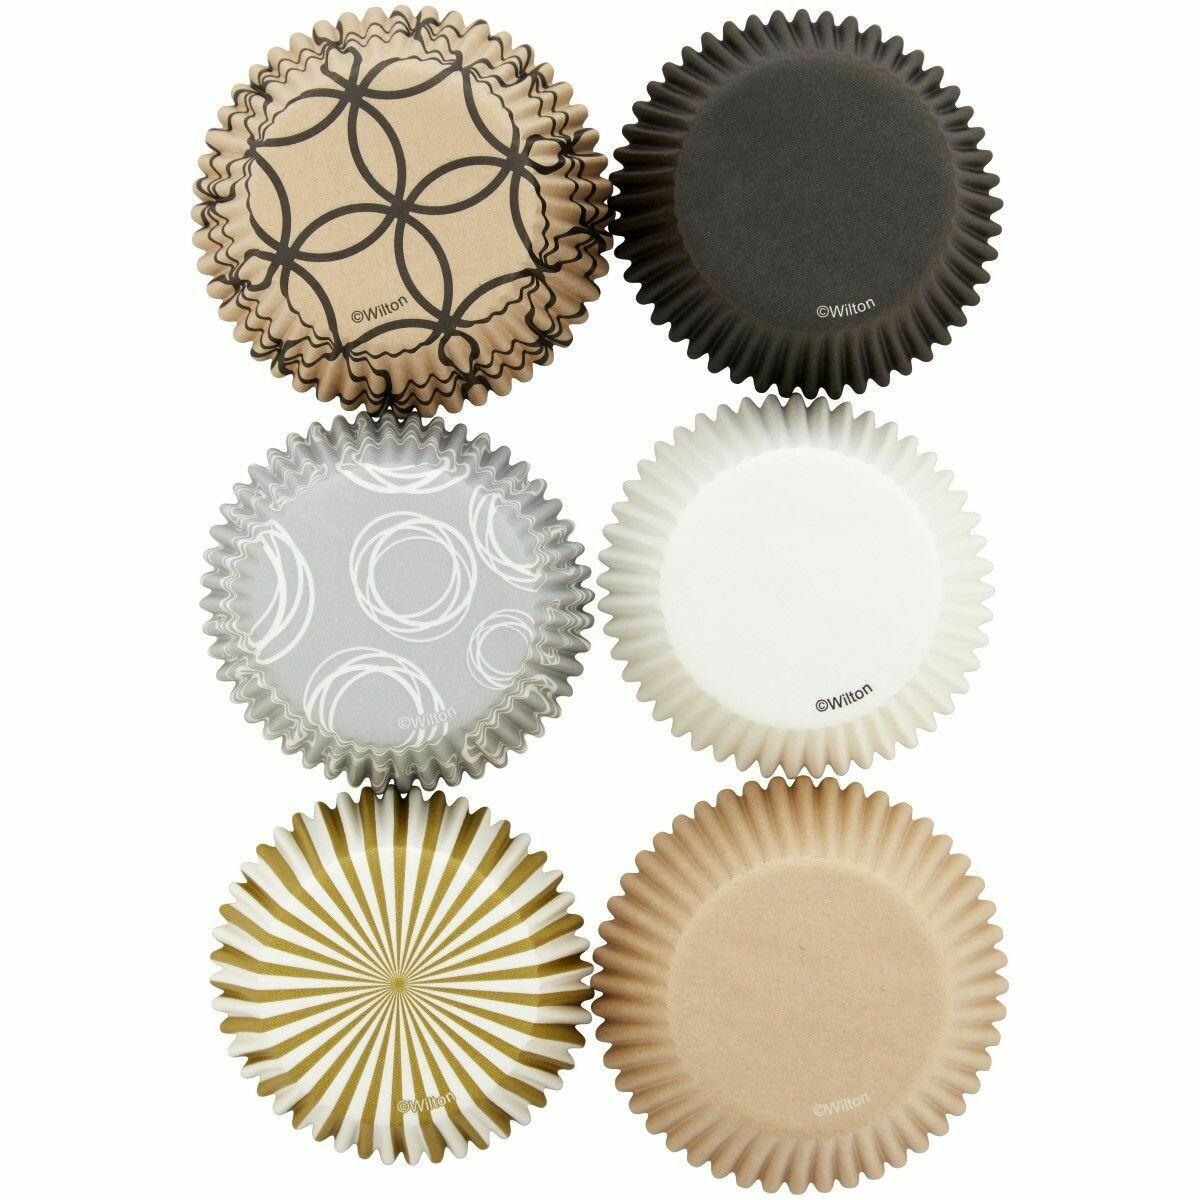 Wilton Cupcake Cases -CELEBRATE -Θήκες ψησίματος Καπκέικ/Μάφιν 150 τεμ σε Μπεζ/Καφέ Αποχρώσεις